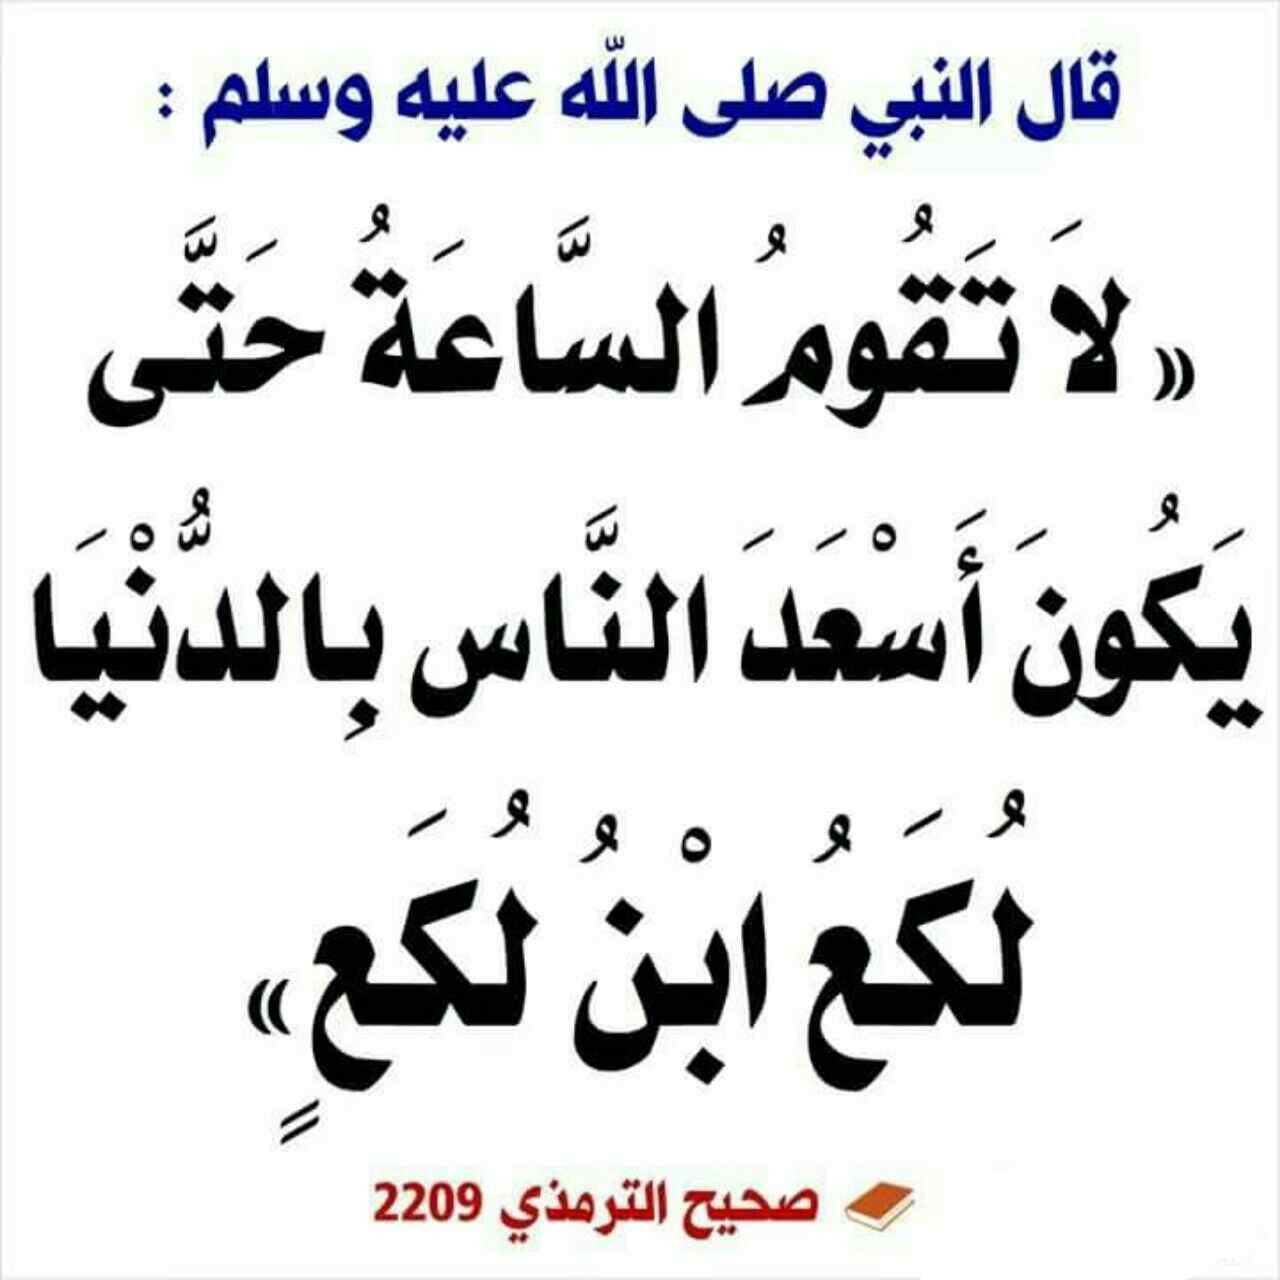 Pin By Ibrahim Oshah On Islamic Quran Verses Islamic Quotes Quran Islam Facts